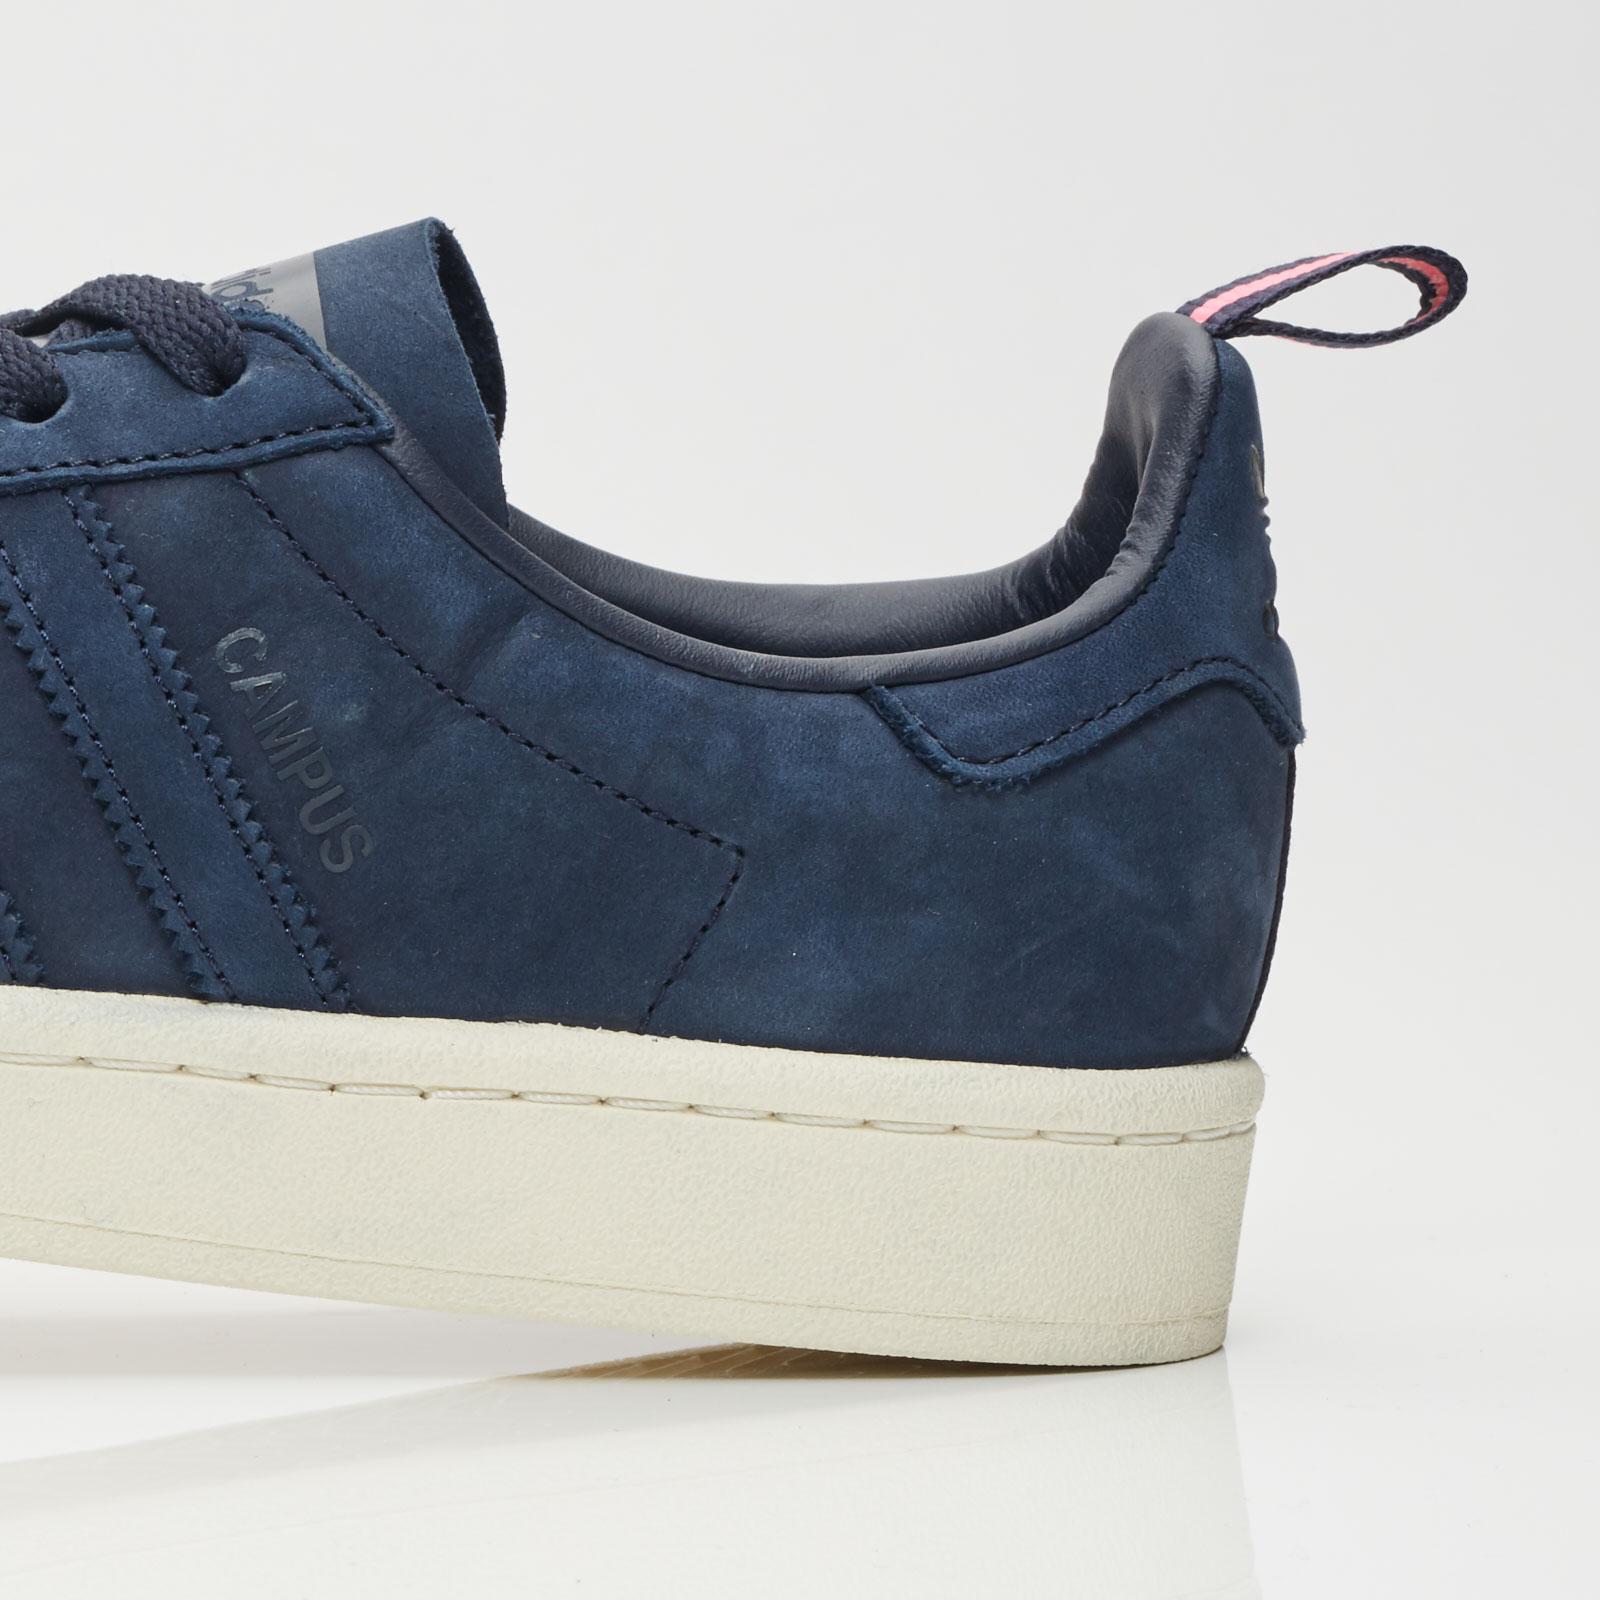 Adidas Campus Bz0066 Scarpe da Ginnasticanstuff Scarpe & Streetwear